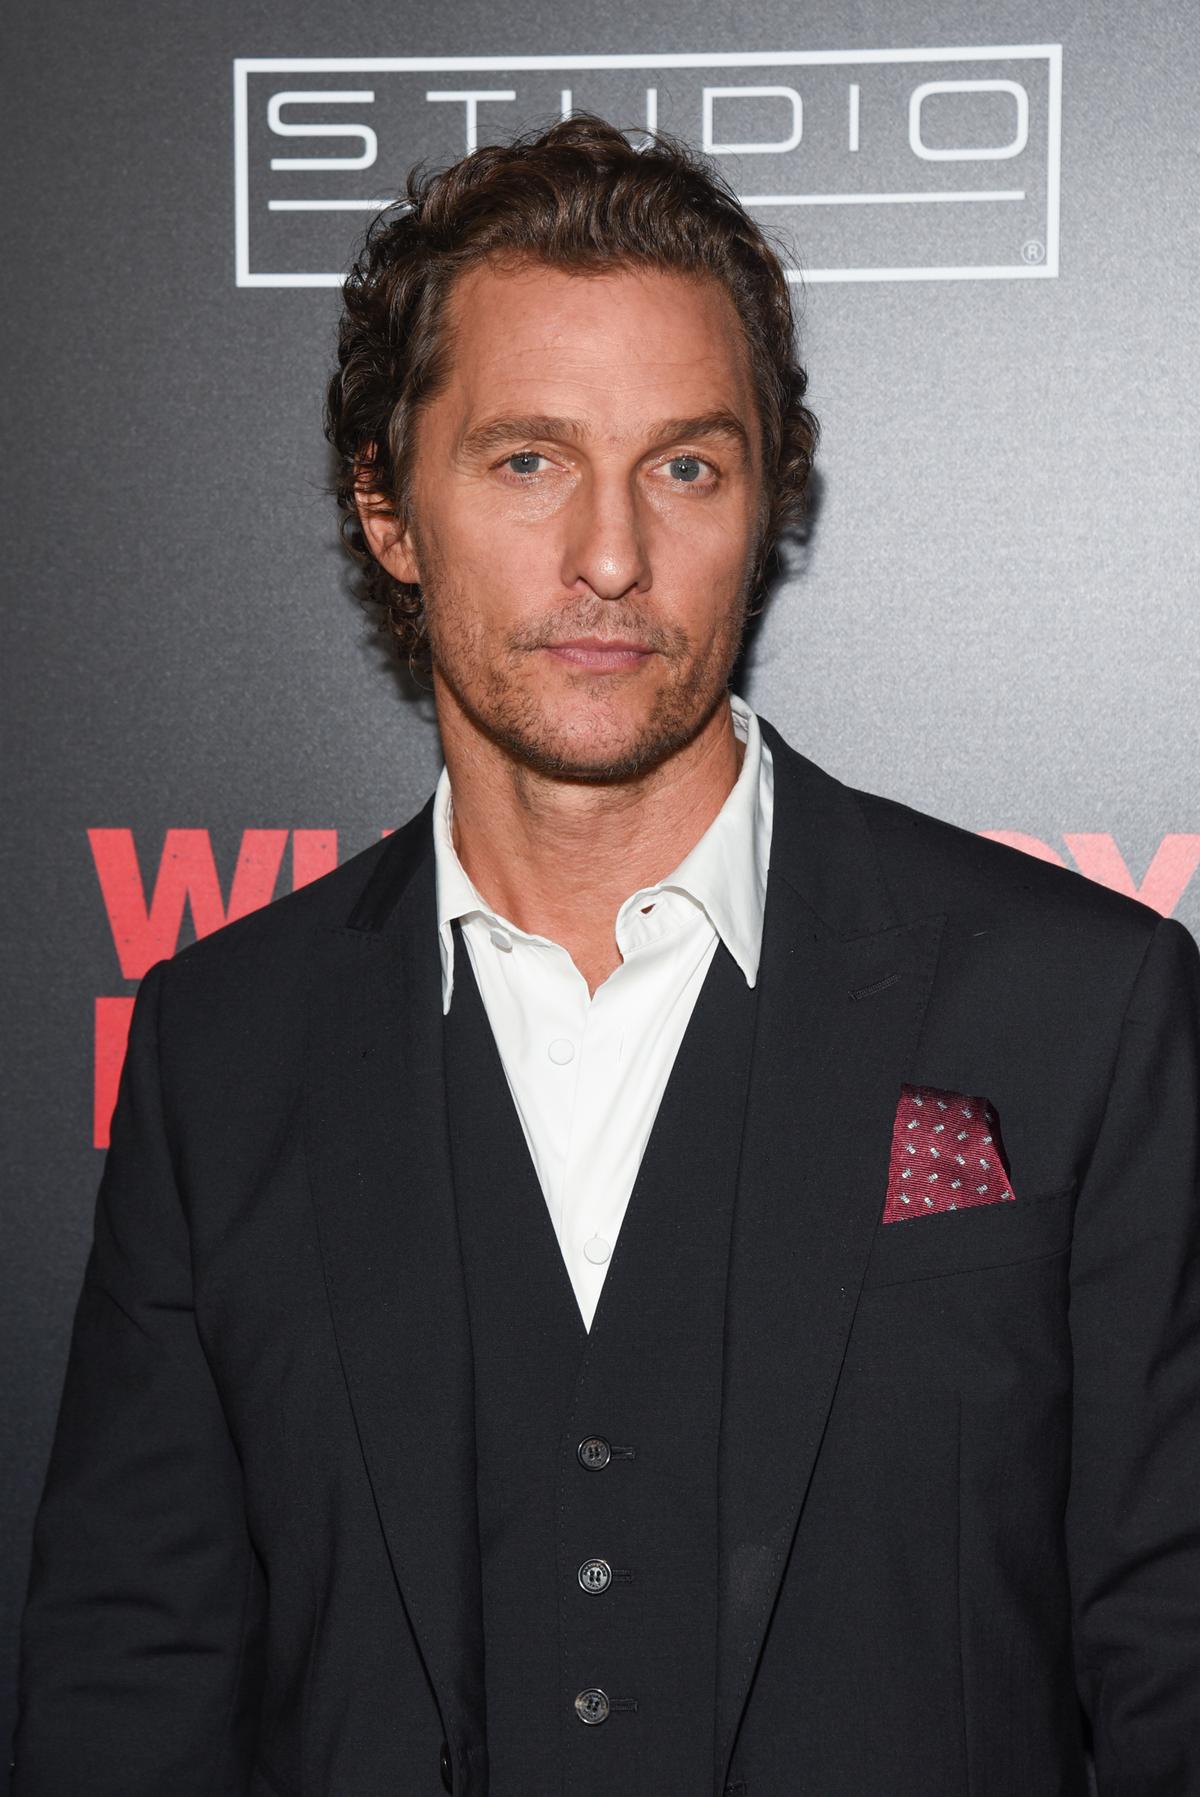 Matthew McConaughey Attends Film Screening Of 'White Boy ...